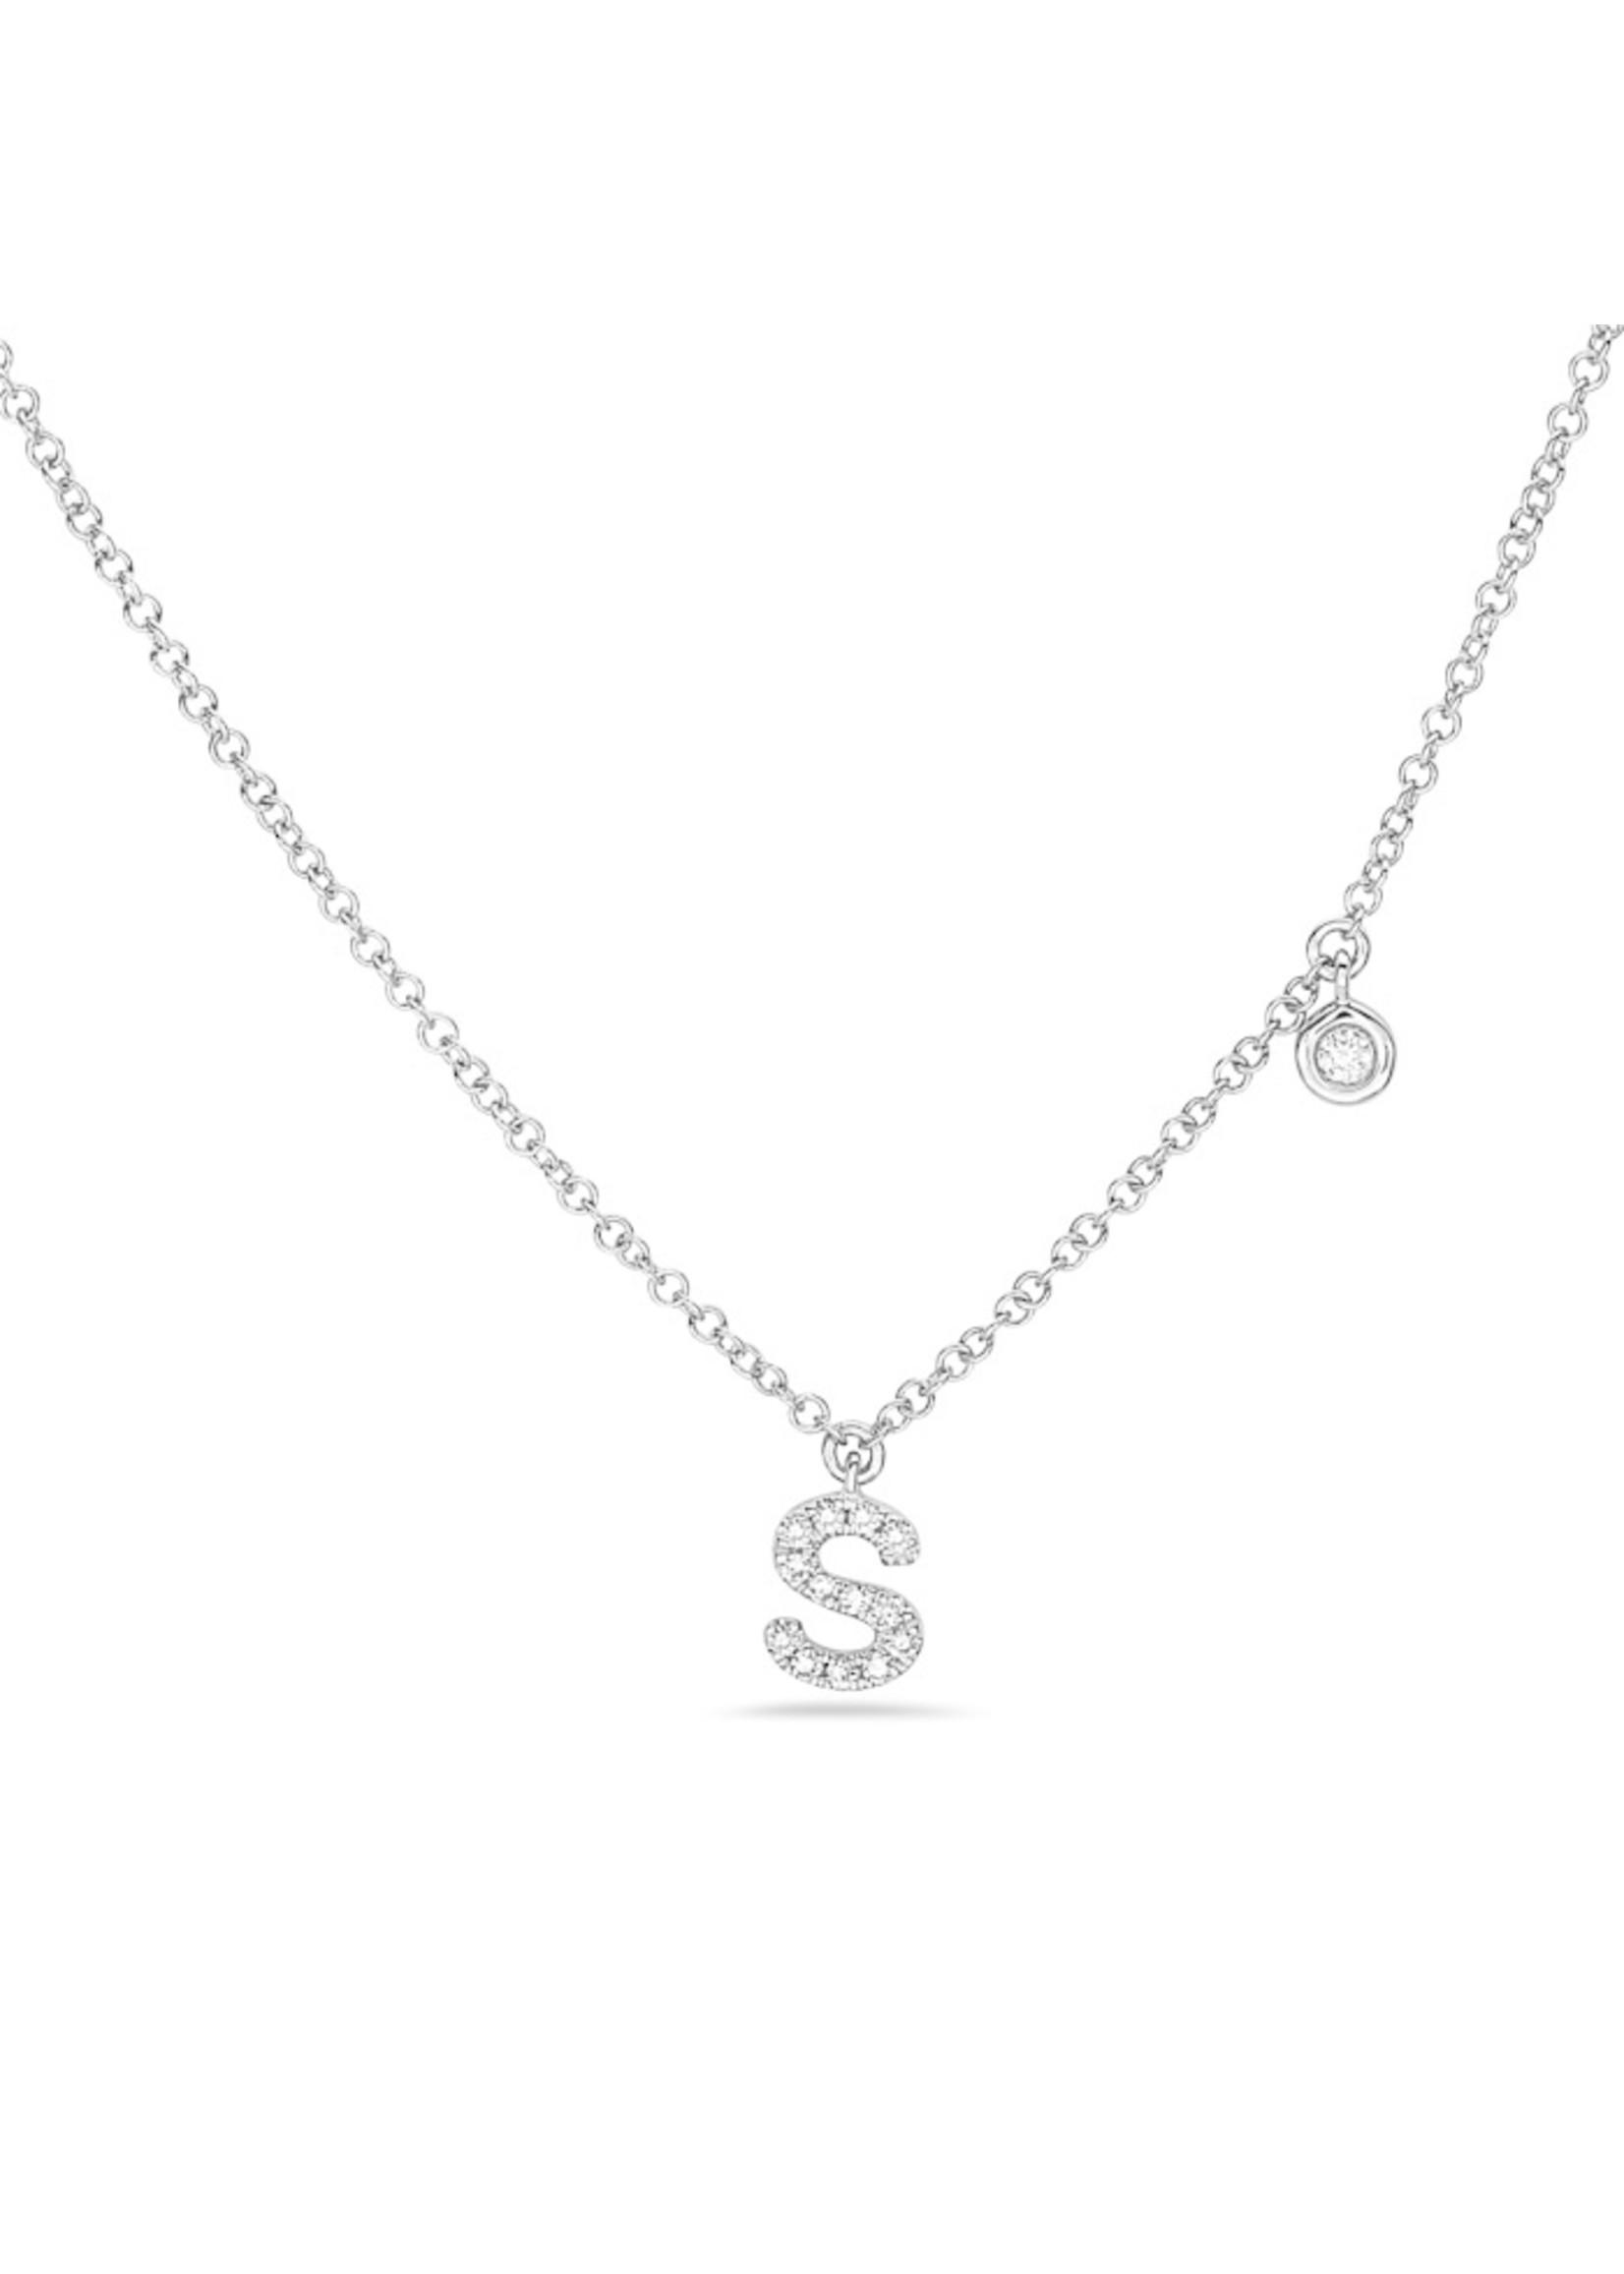 Jill Alberts Initial Necklace